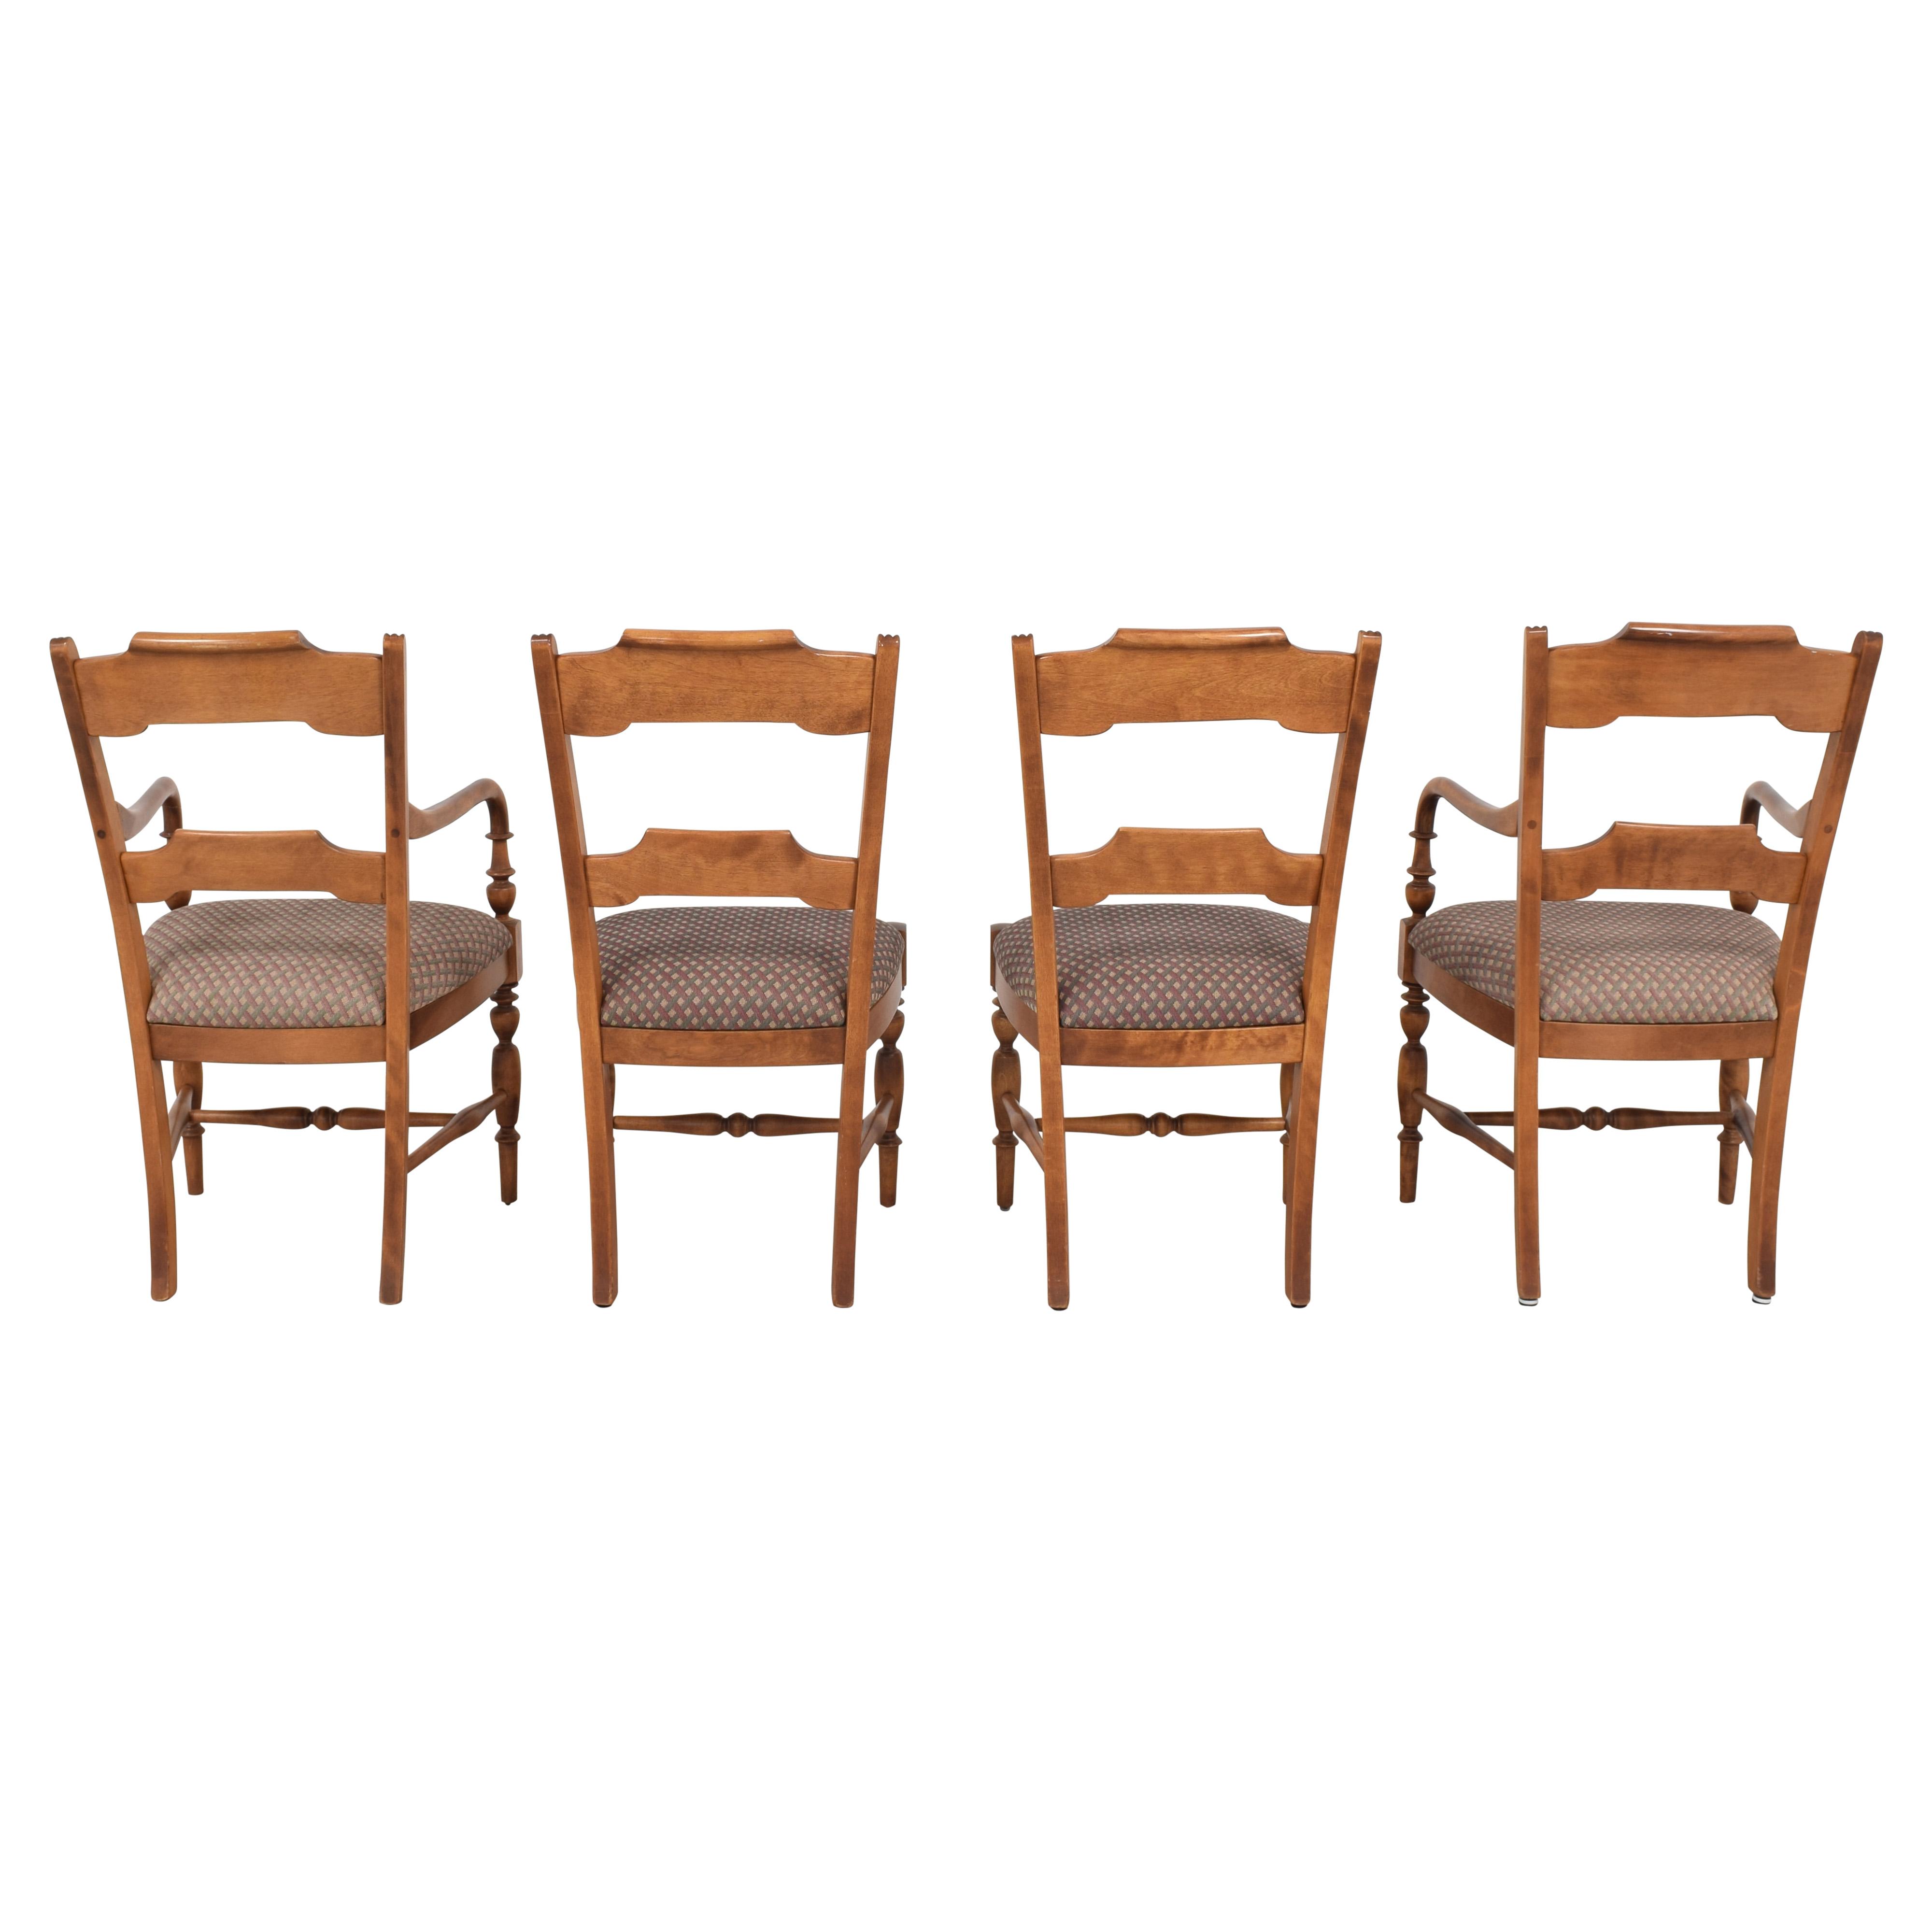 Nichols & Stone Nichols & Stone Dining Chairs dimensions